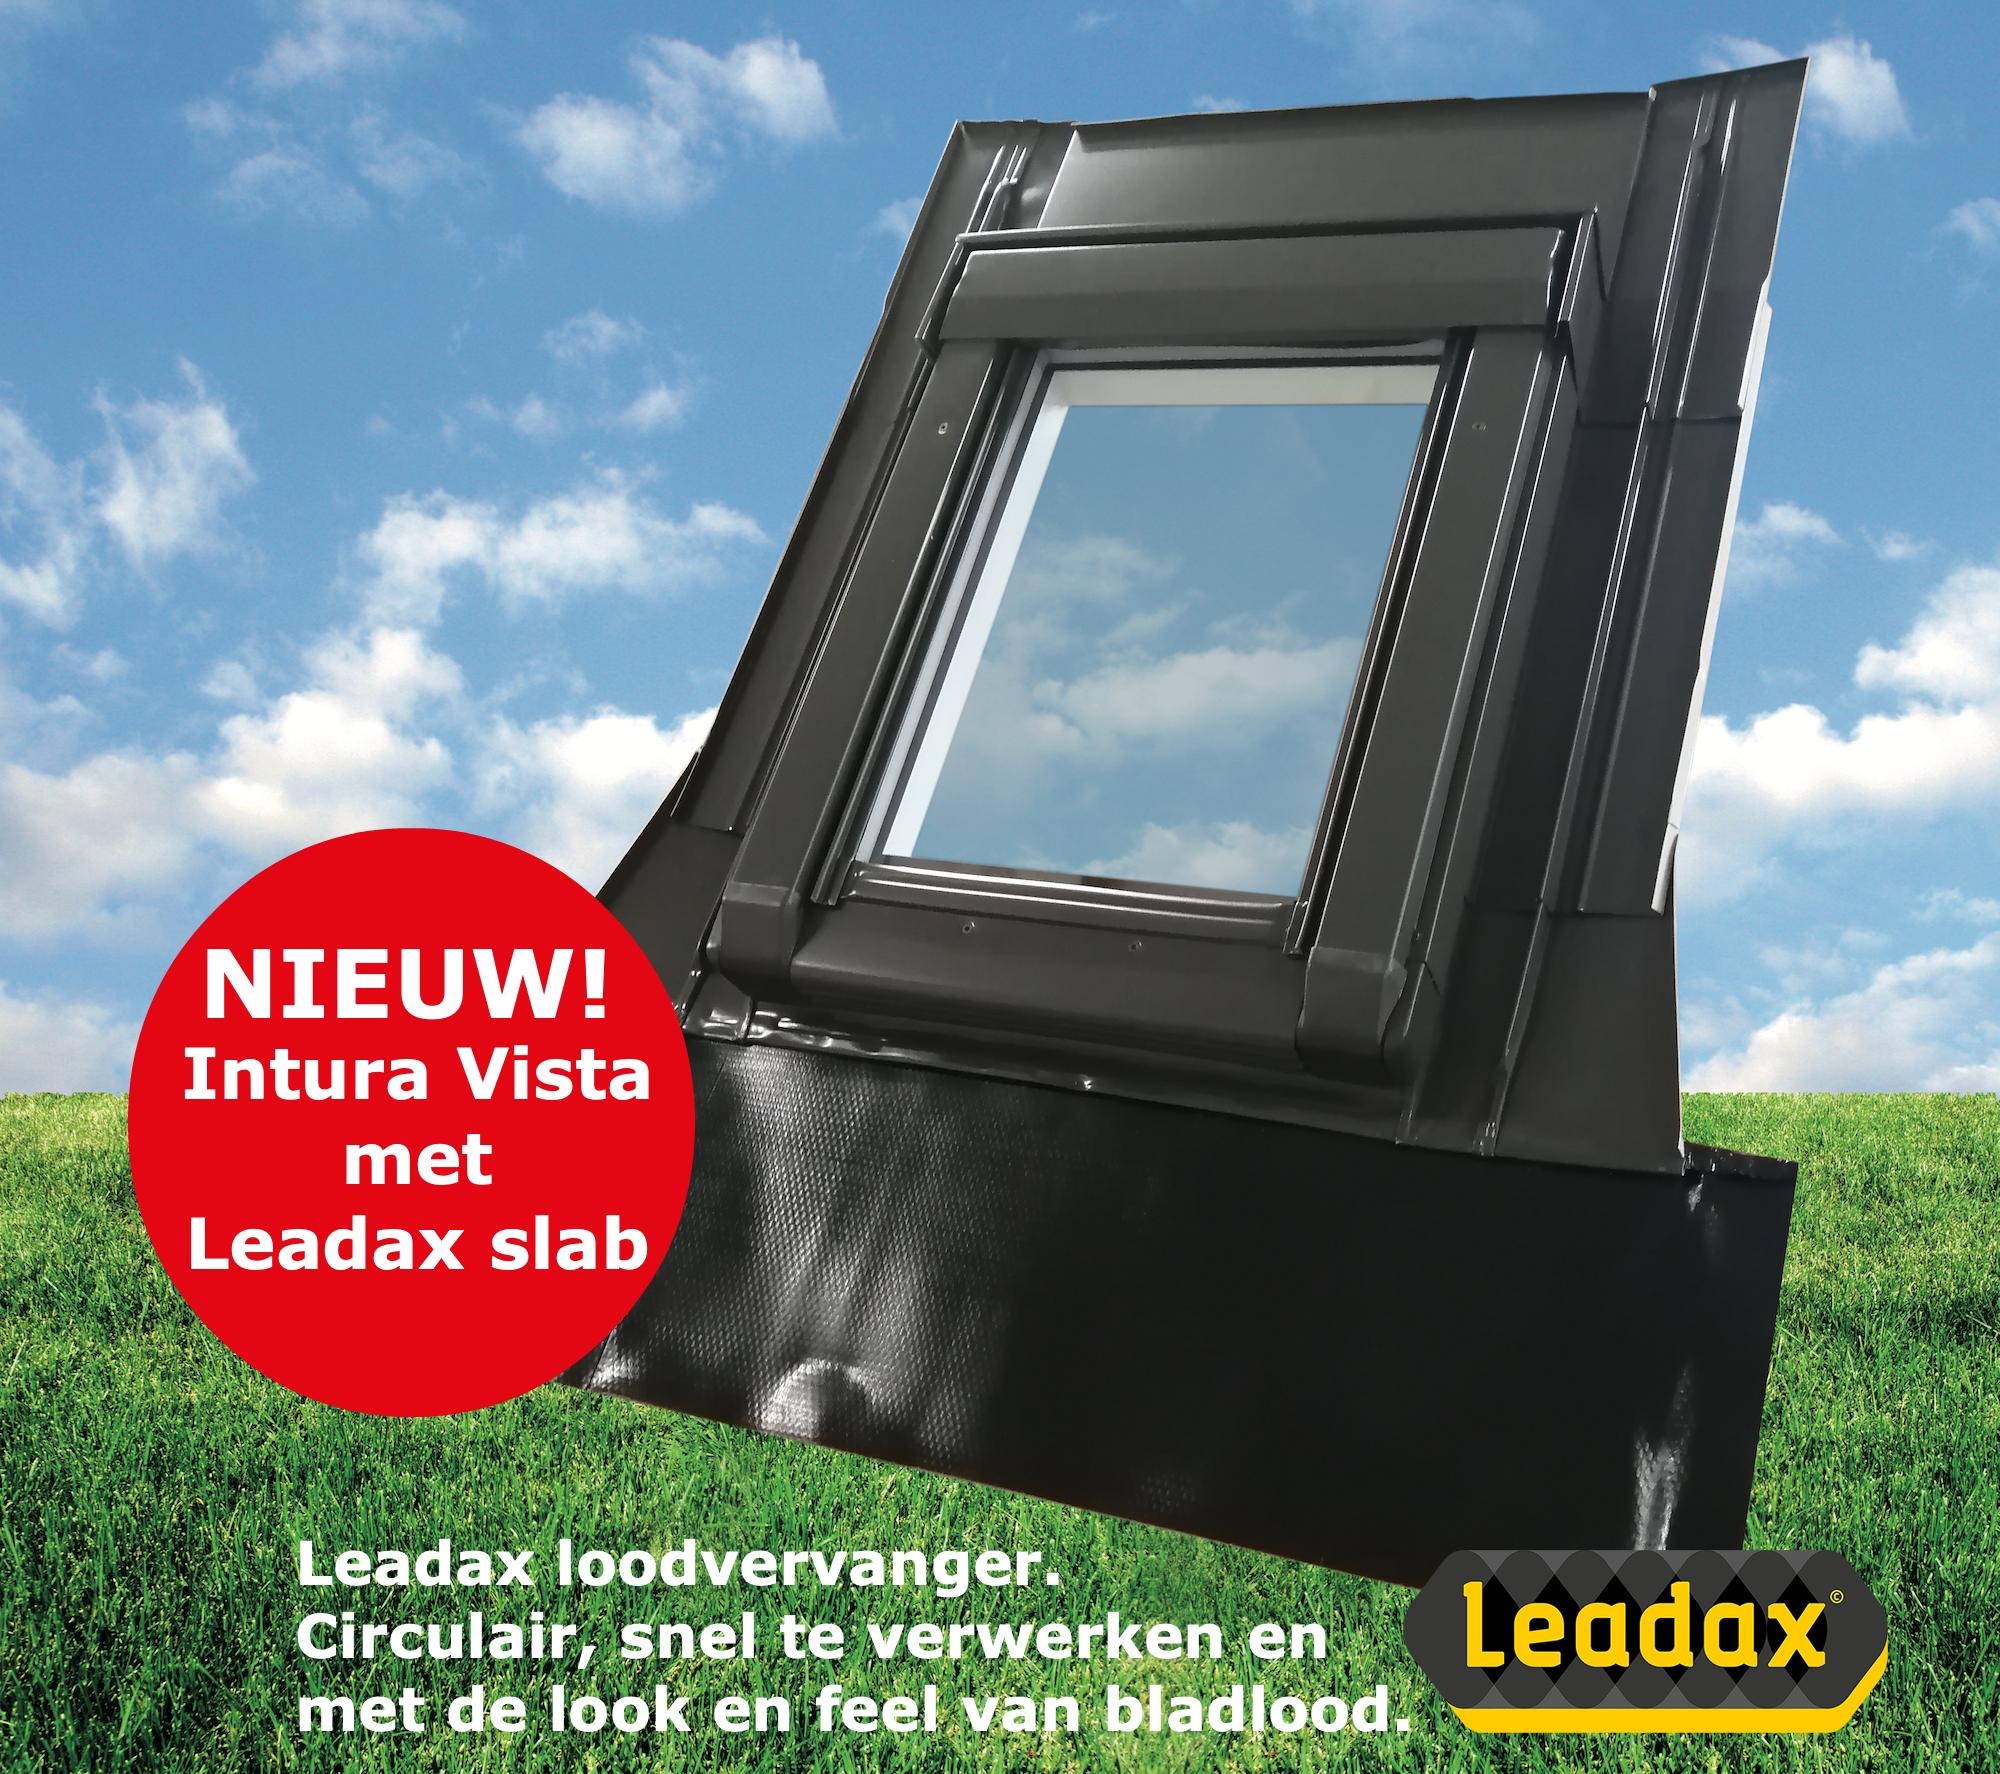 Intura Vista met Leadax